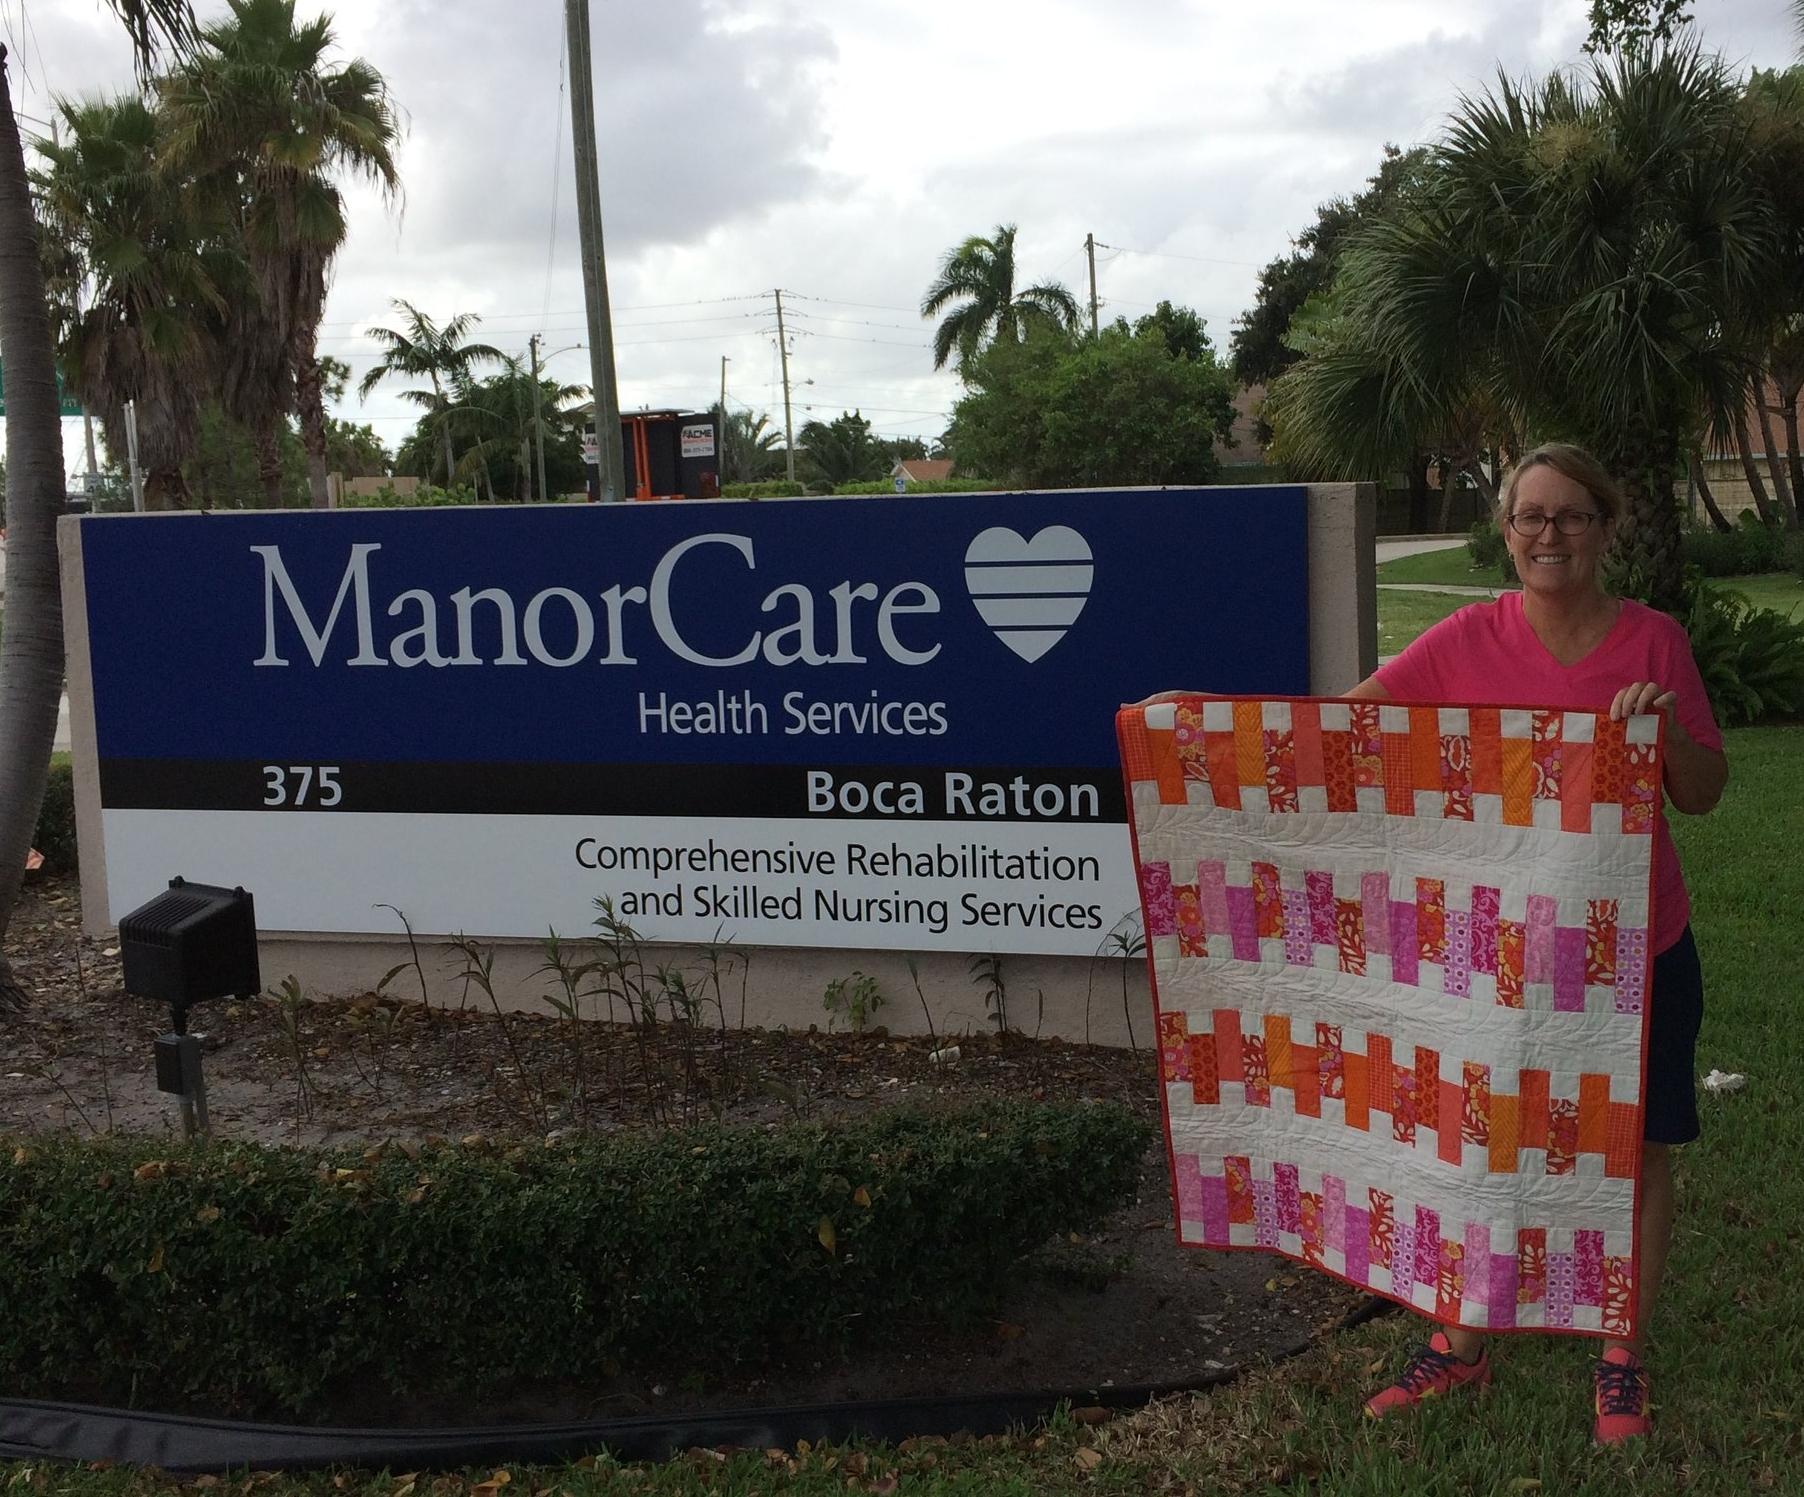 Manor Care nursing home in Boca Raton